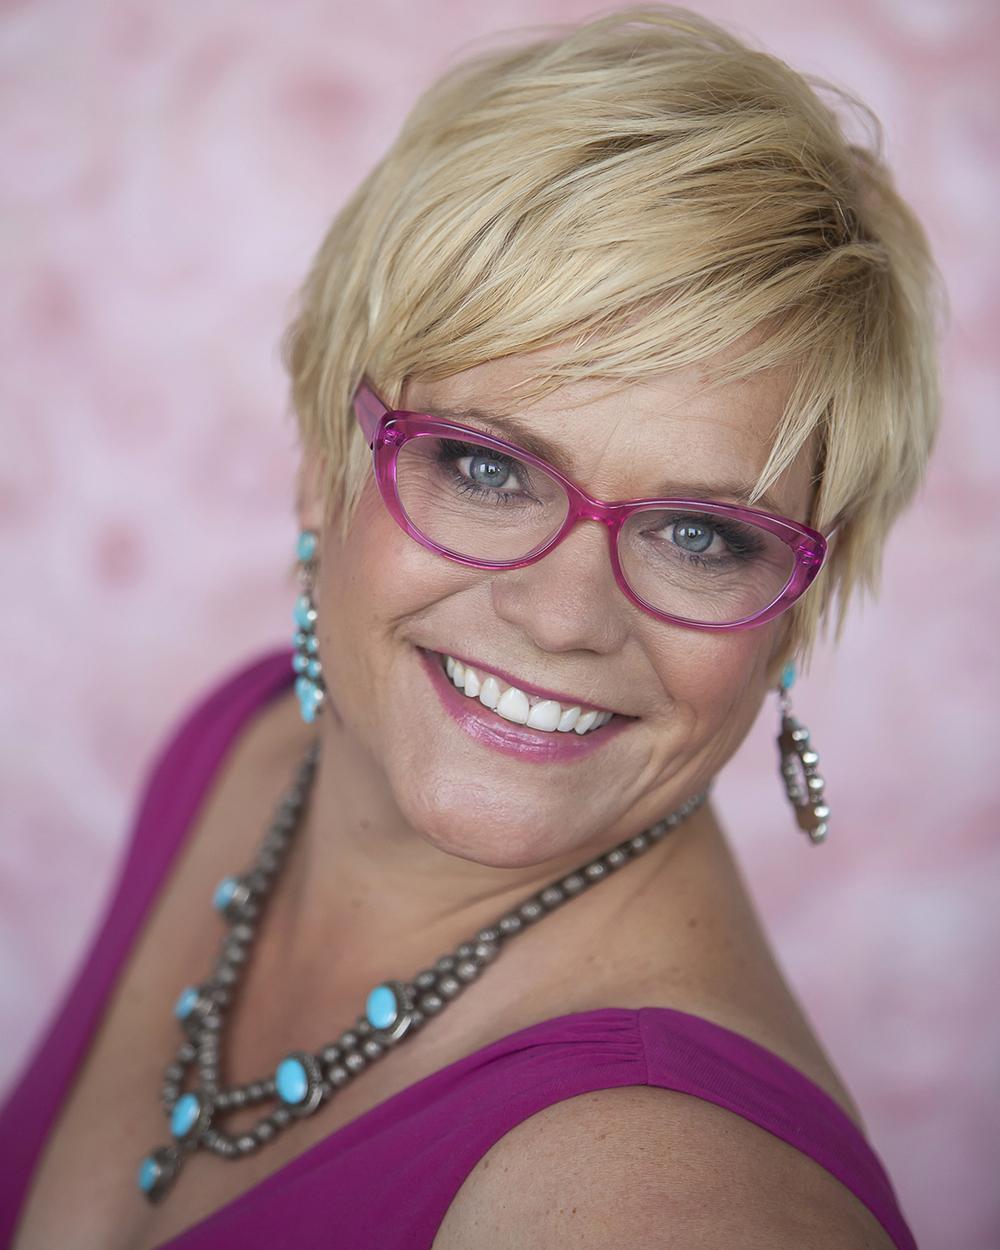 Personal Branding Photos with Denver photographer Jennifer Koskinen | Merritt Portrait Studio